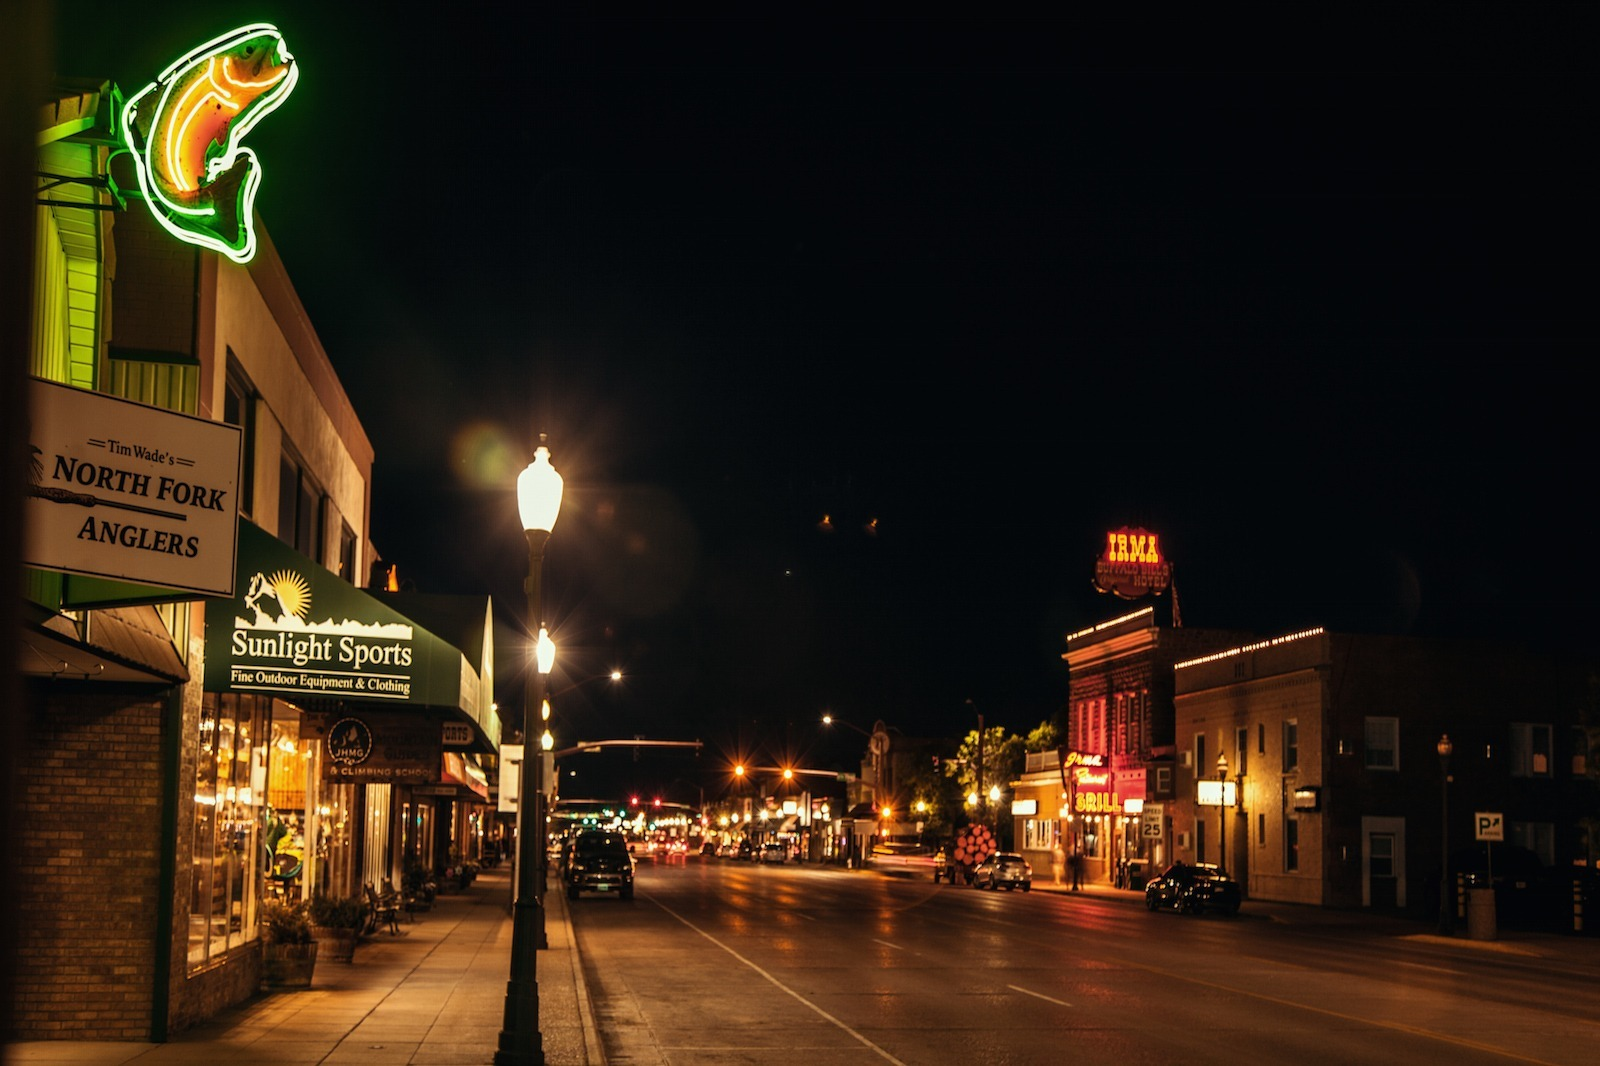 Main Street Cody, Wyoming for grand American adventures